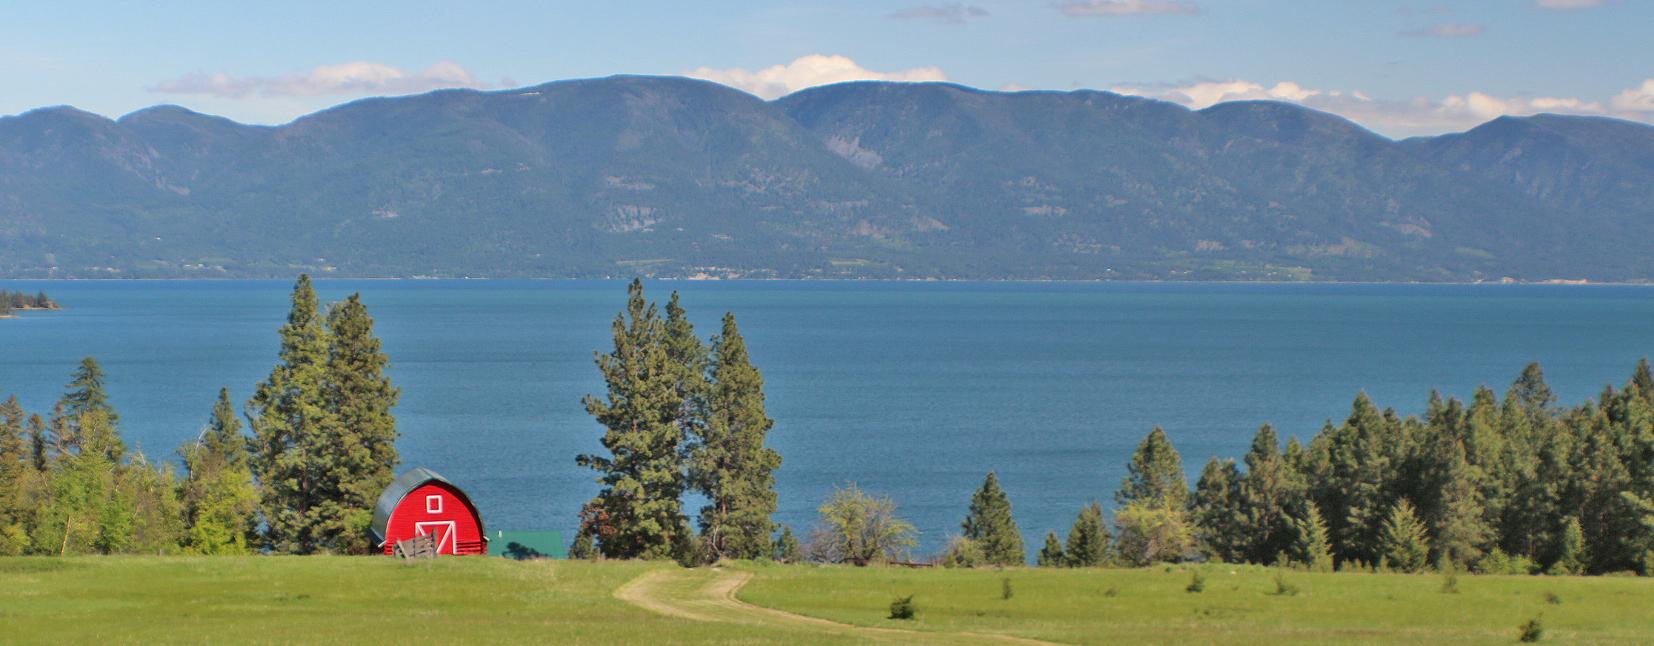 Virginia Mountain Lake Property For Sale